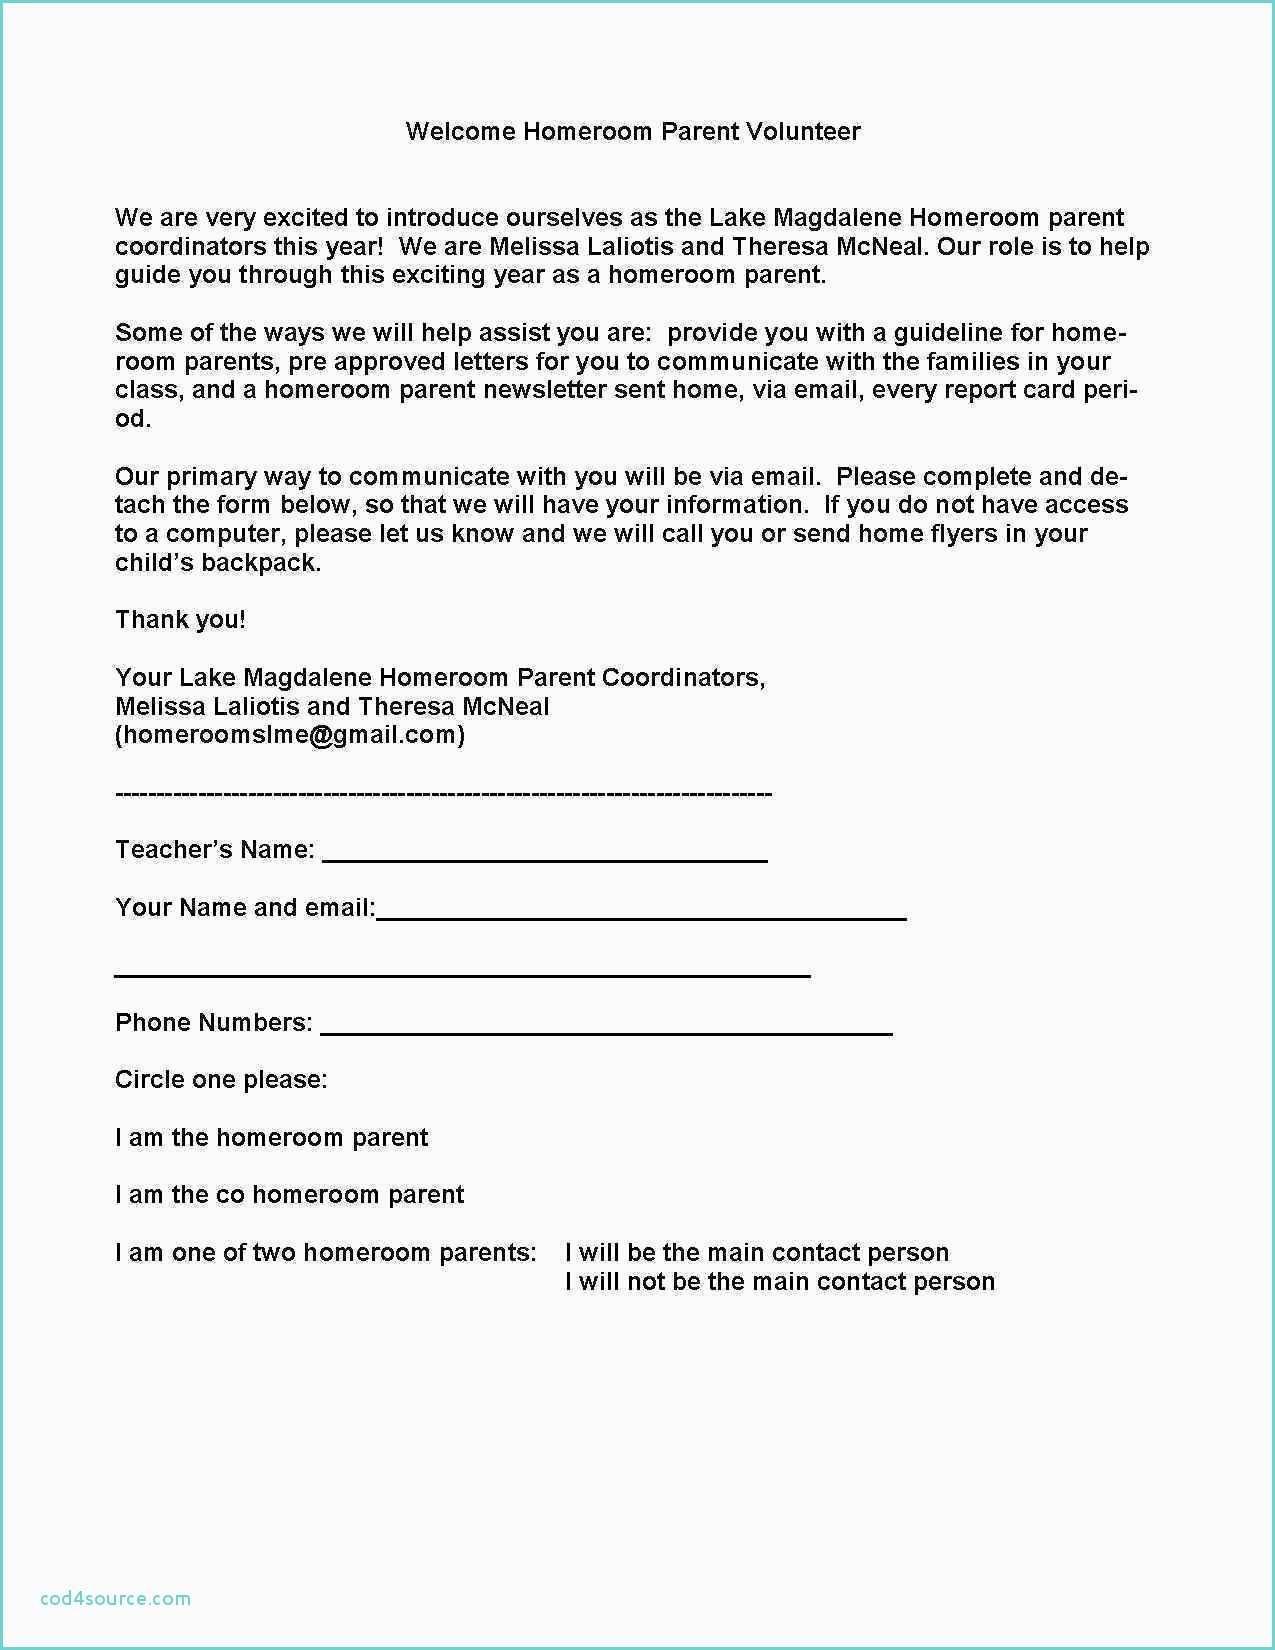 501c3 Charitable Donation Form